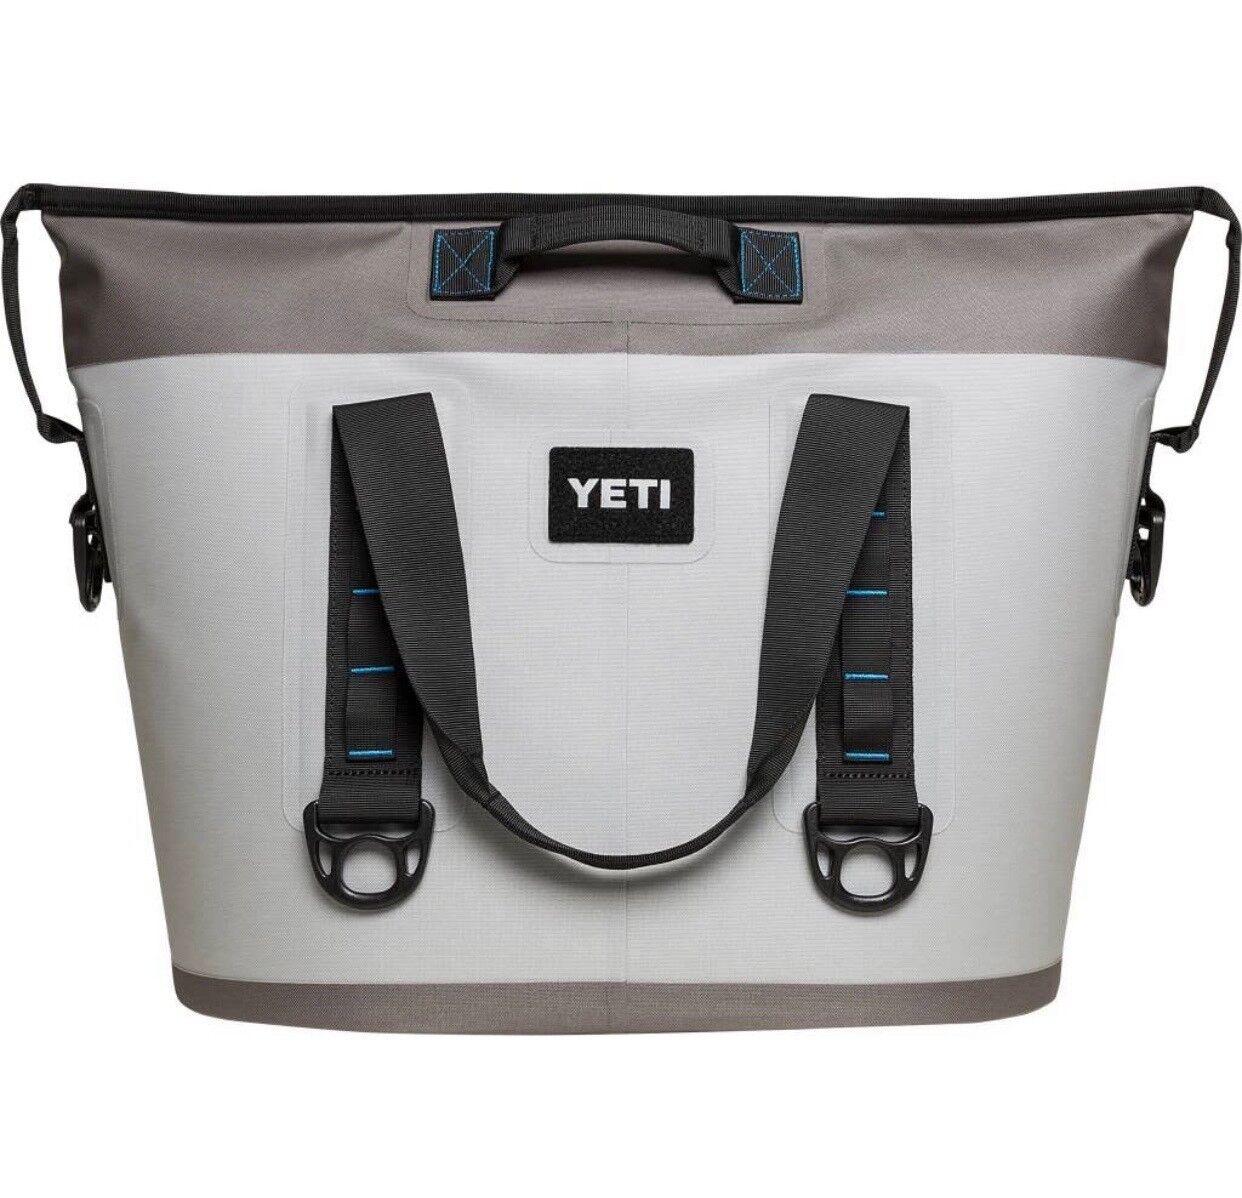 Yeti Hopper  Two 30 - Brand New -  40% off